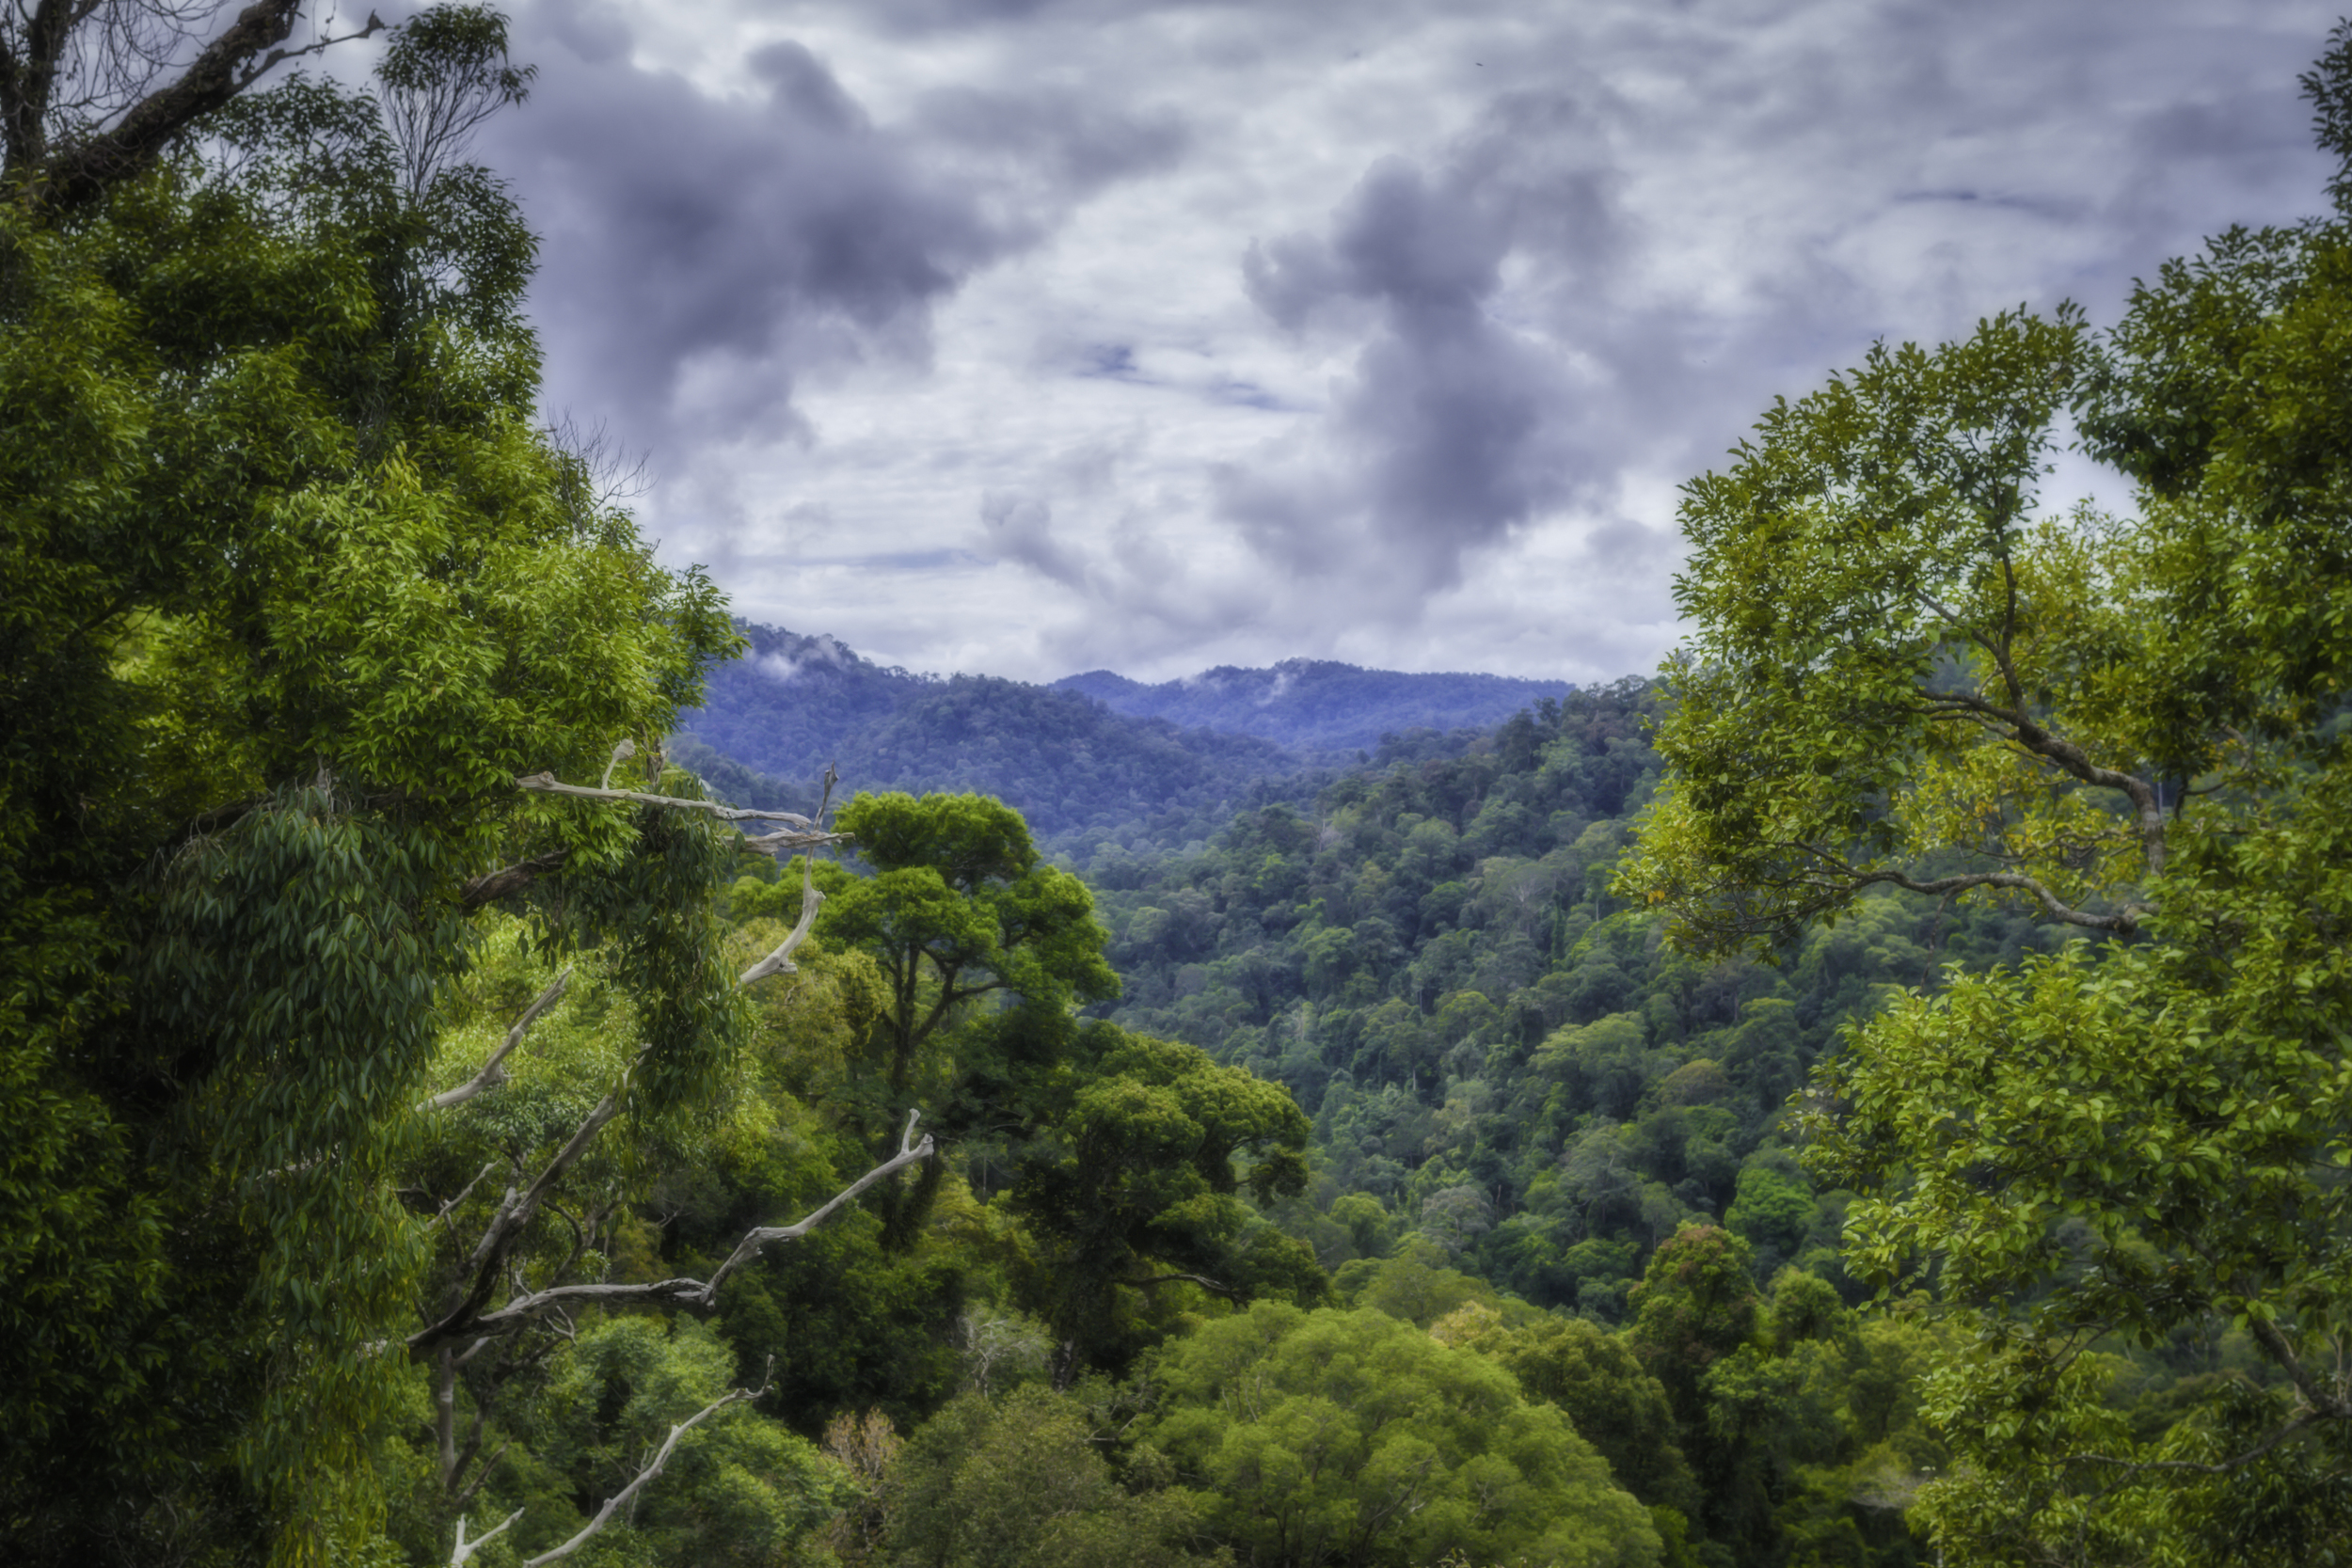 Revealing The Rainforest of Borneo